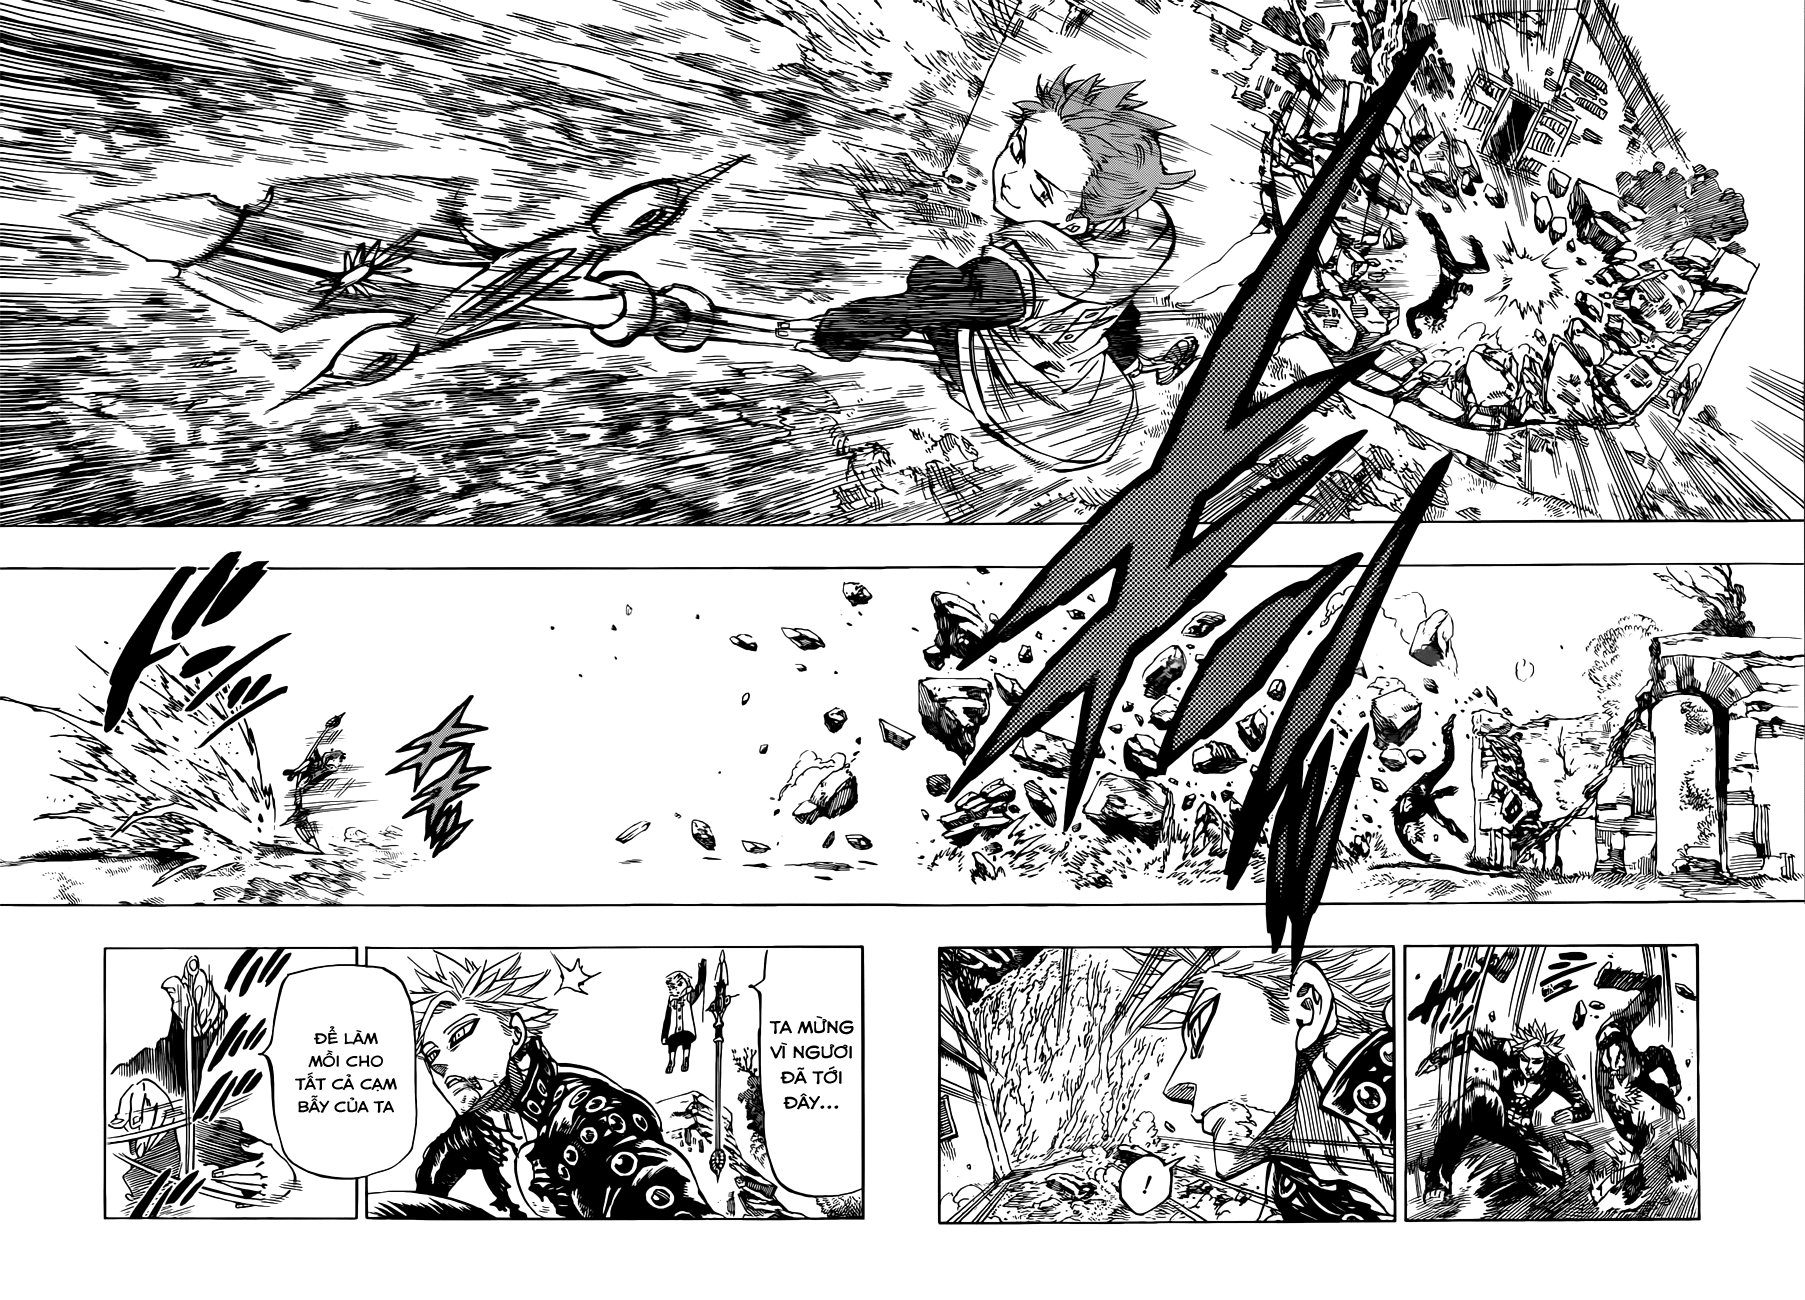 Nanatsu no Taizai - Thất Hình Đại Tội chap 19 page 11 - IZTruyenTranh.com